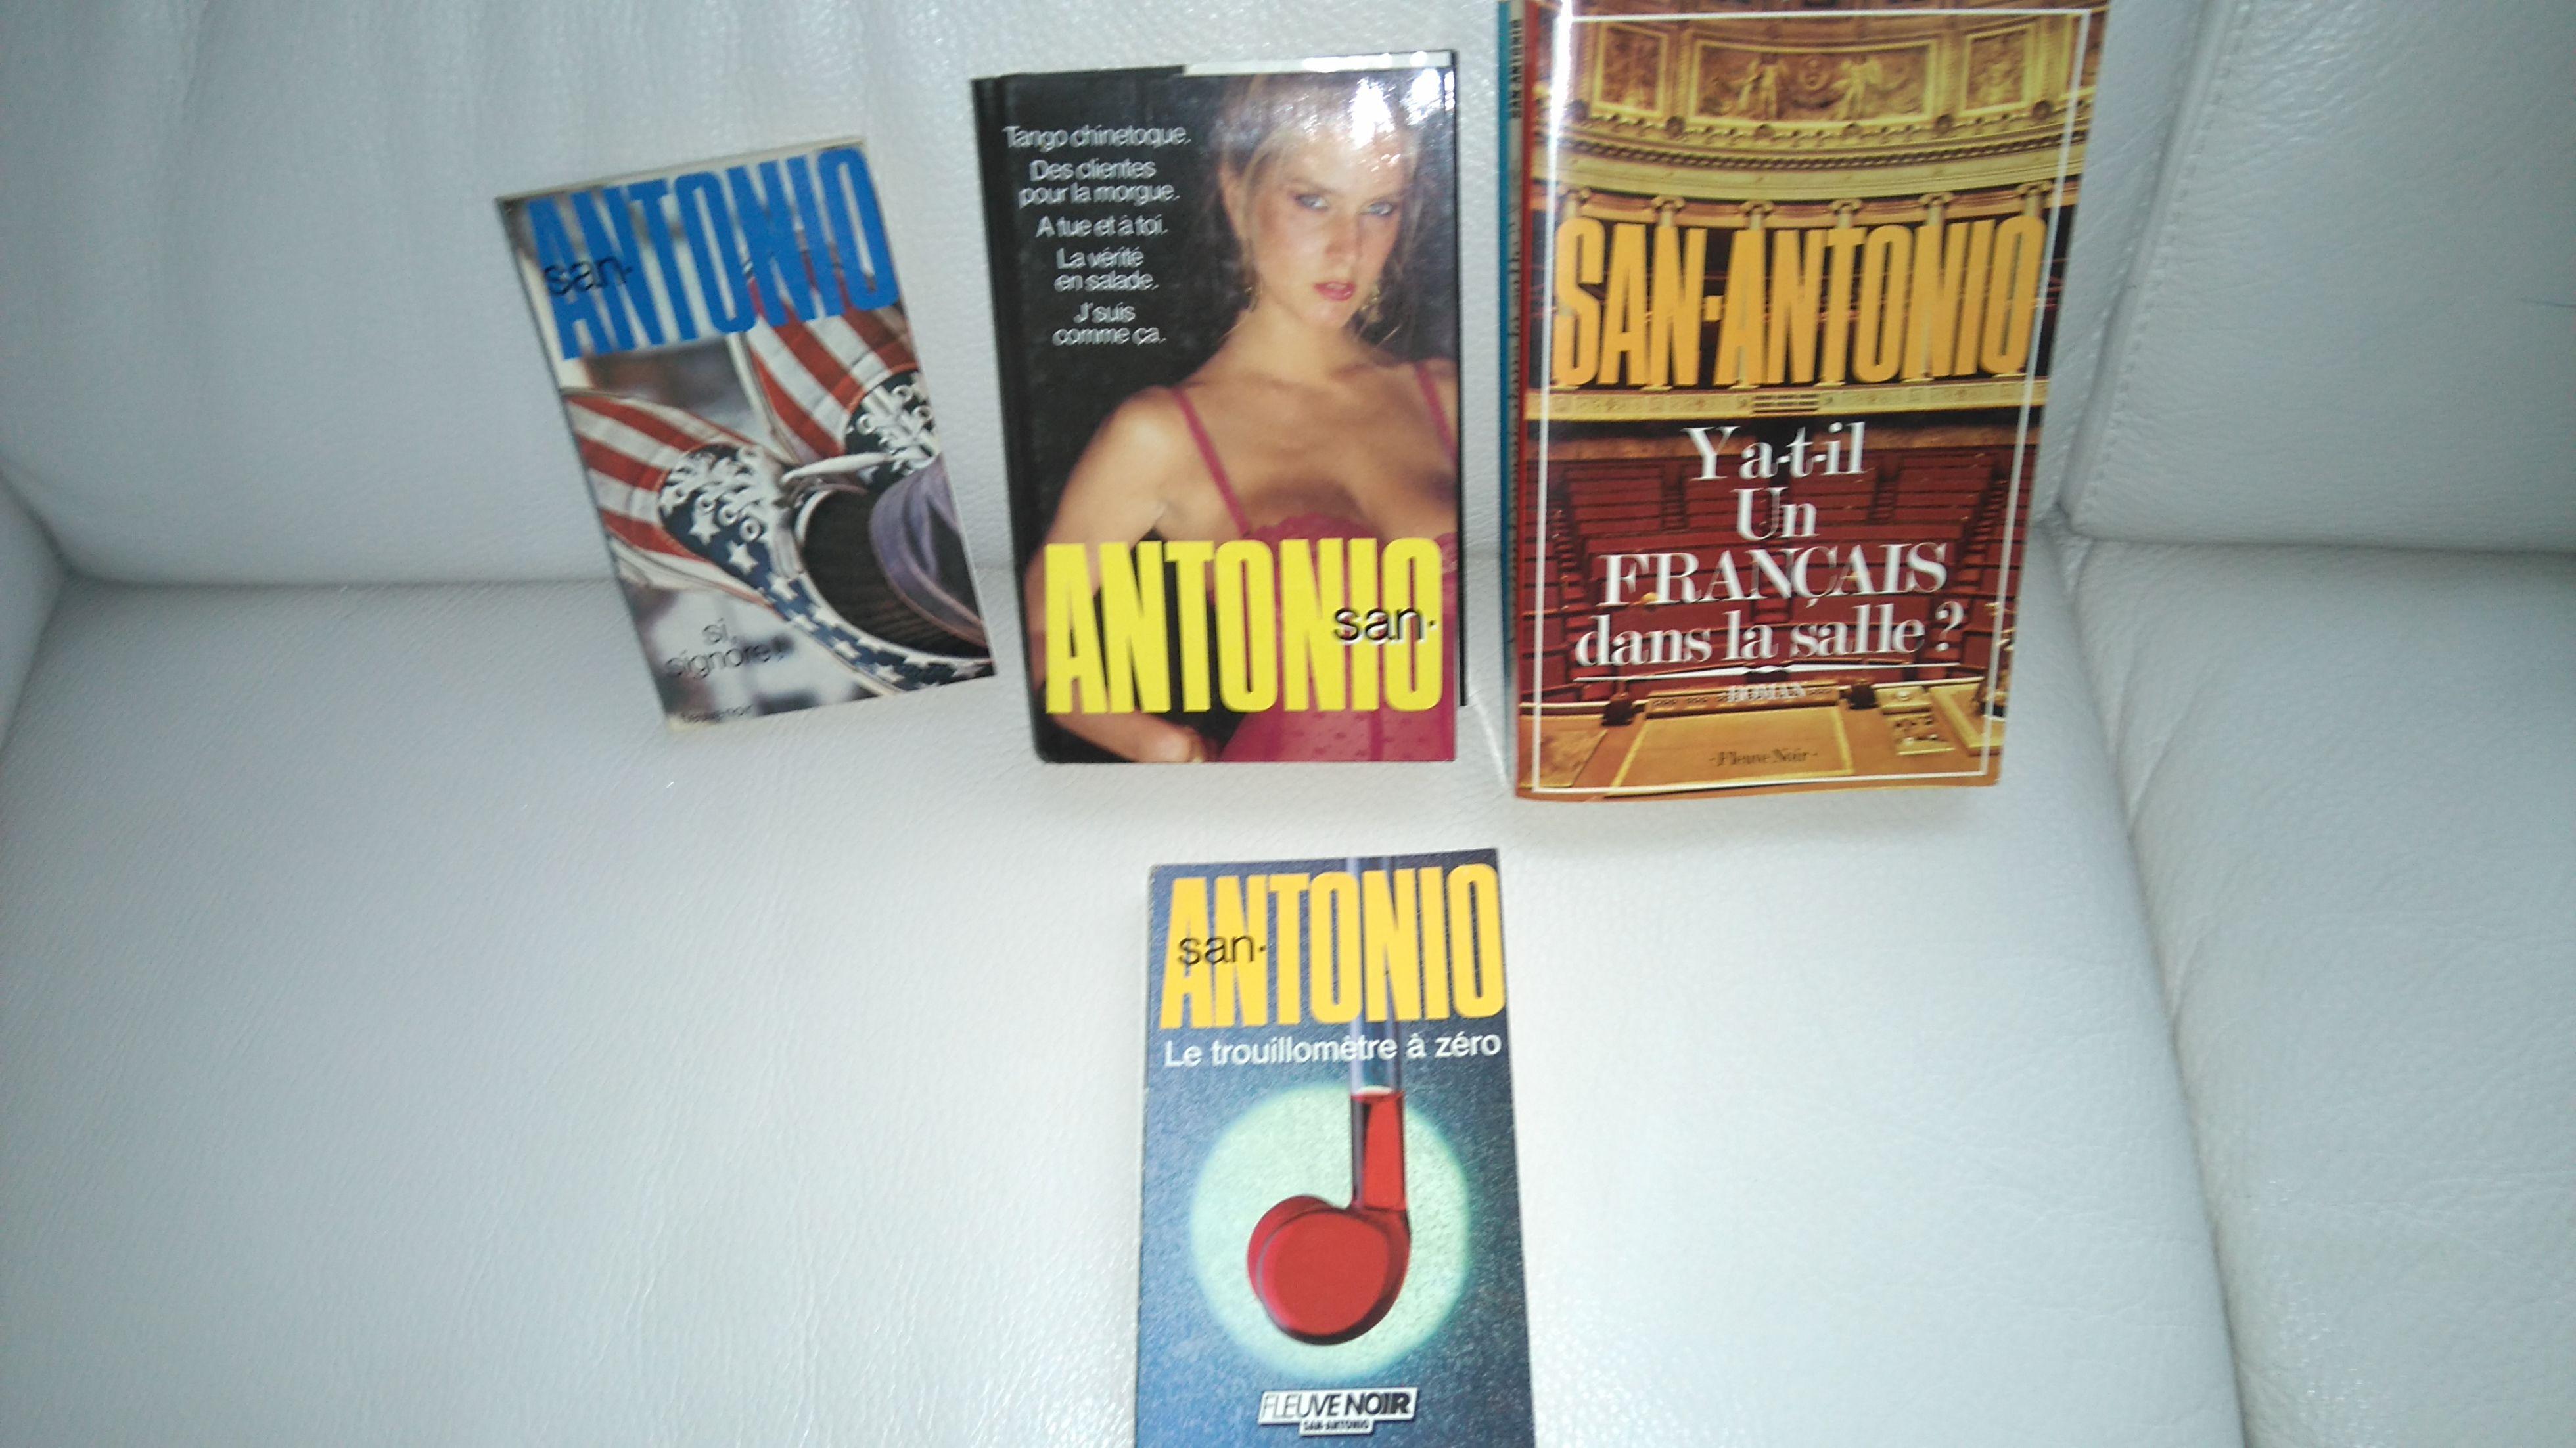 vends livres :  Stephen King et Son Antonio 85 Vendenheim (67)